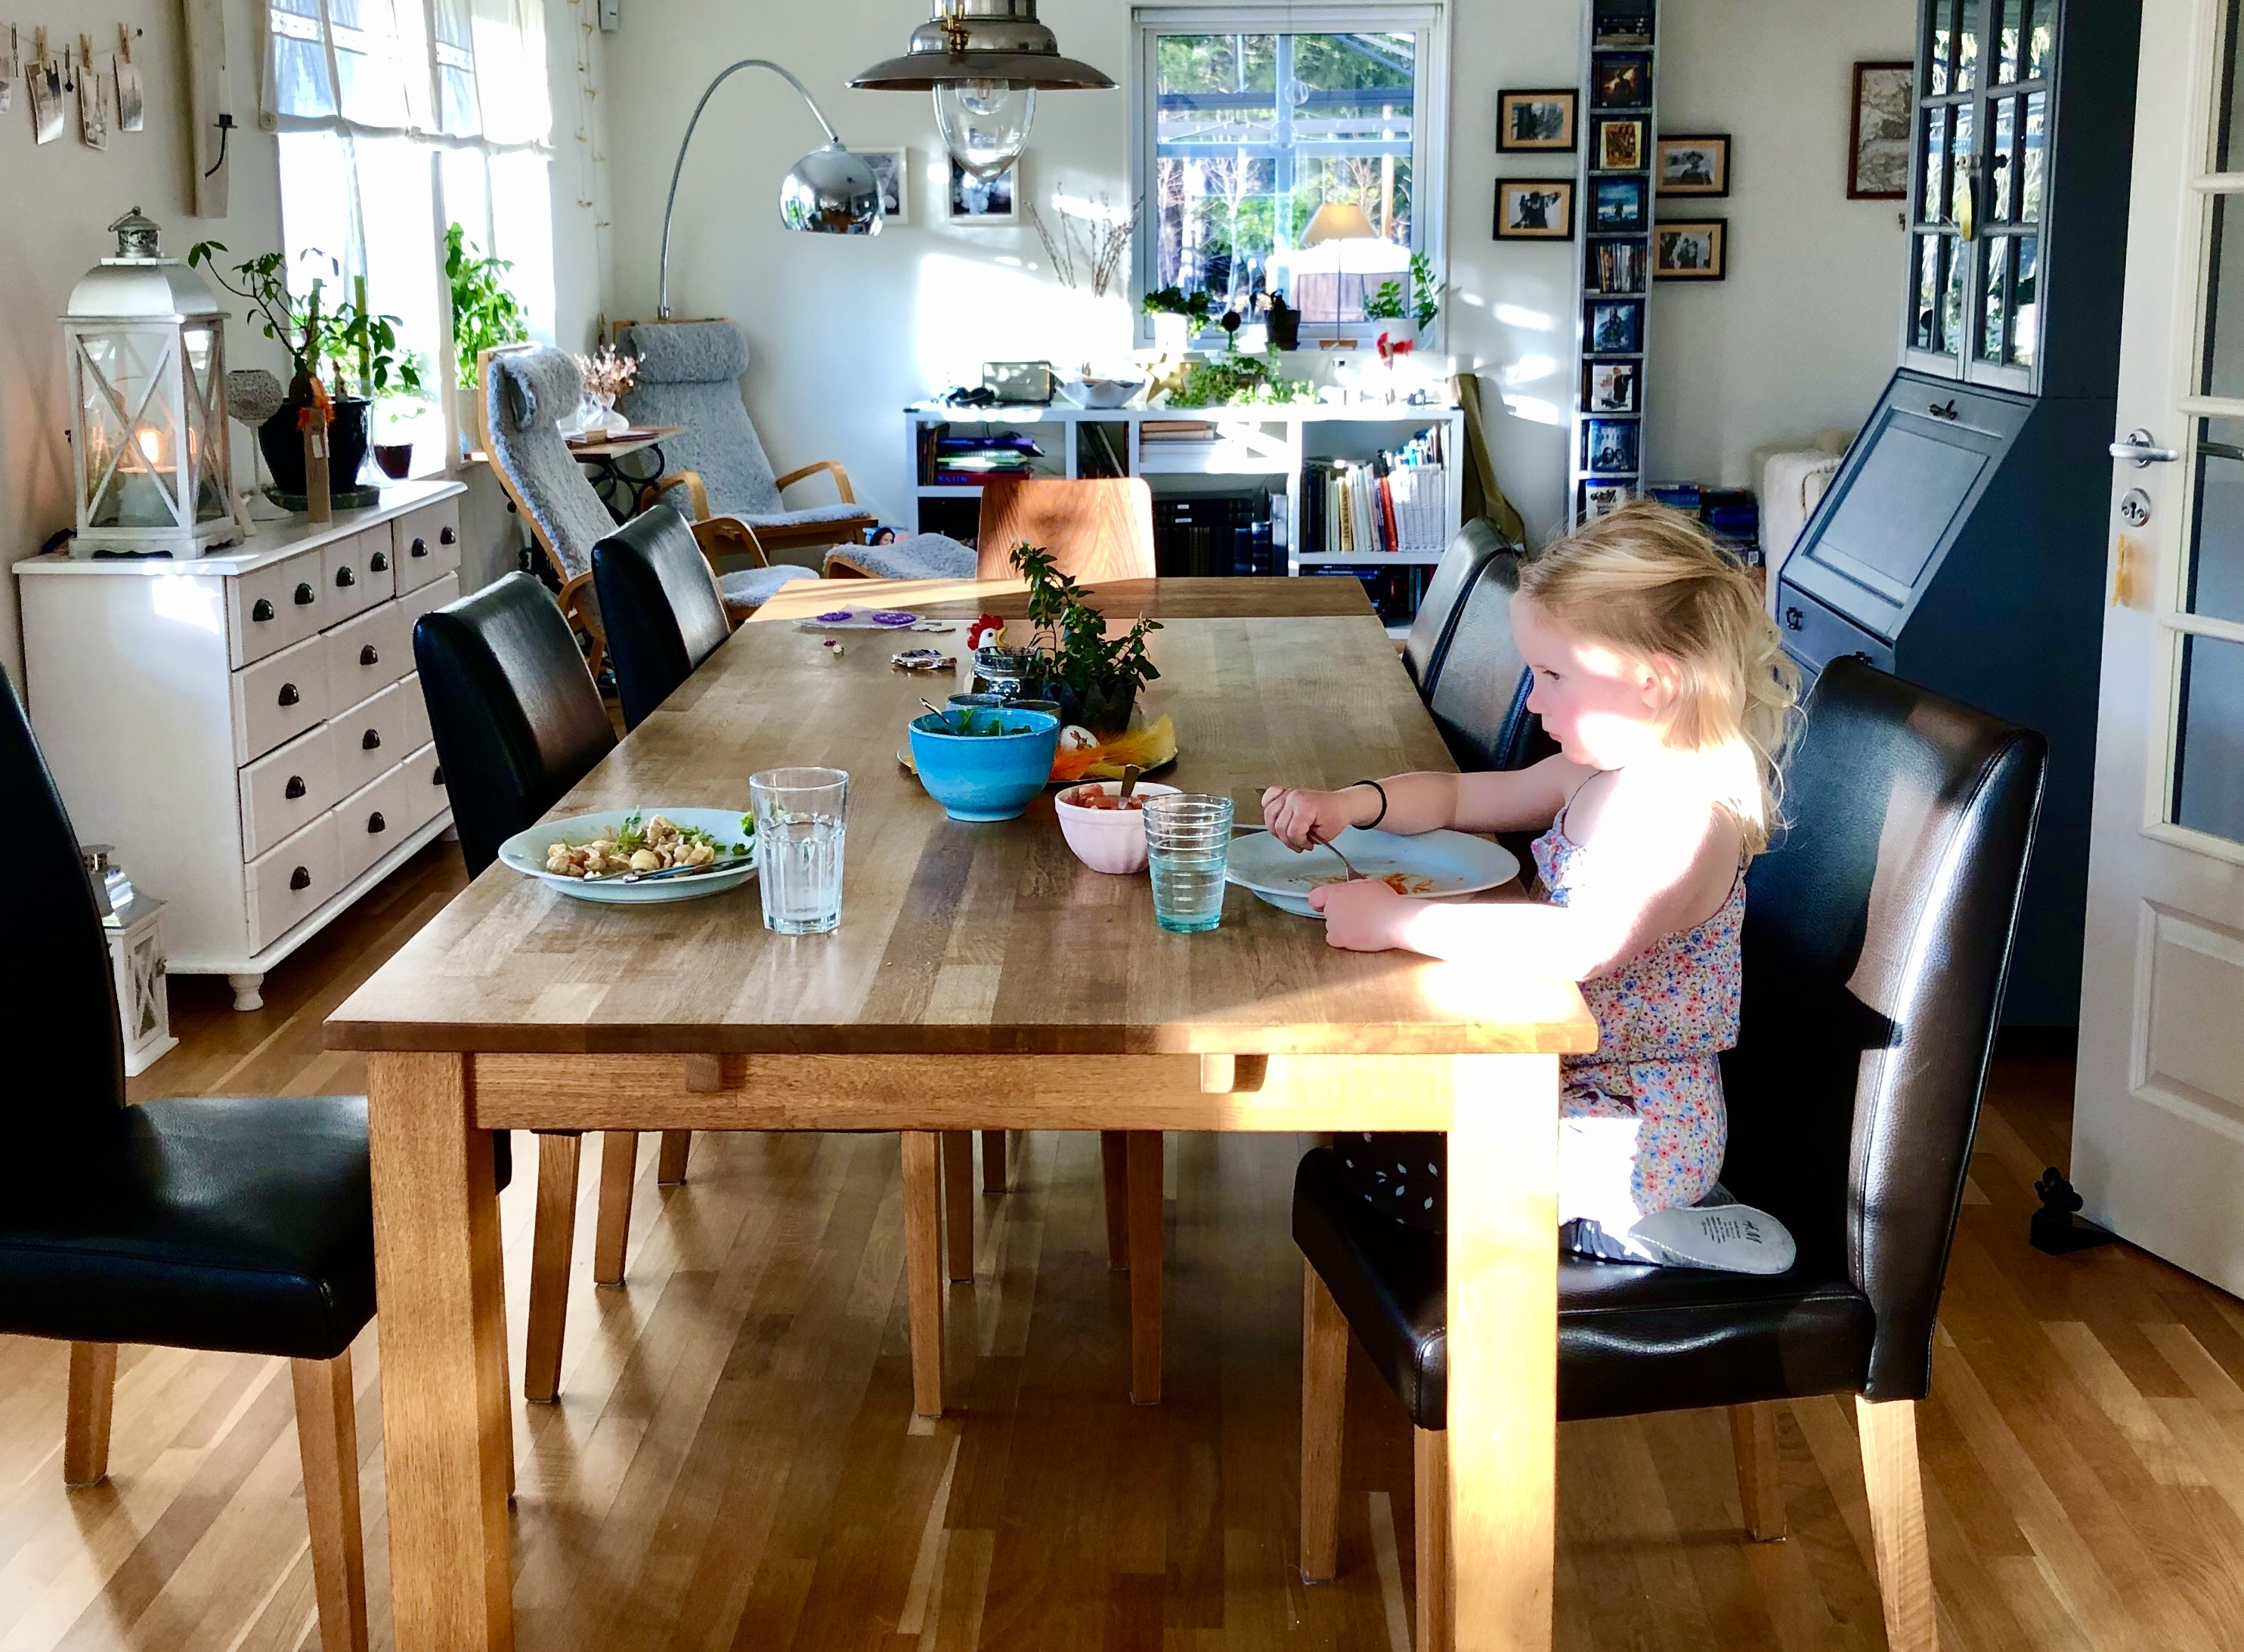 Middag med dottern